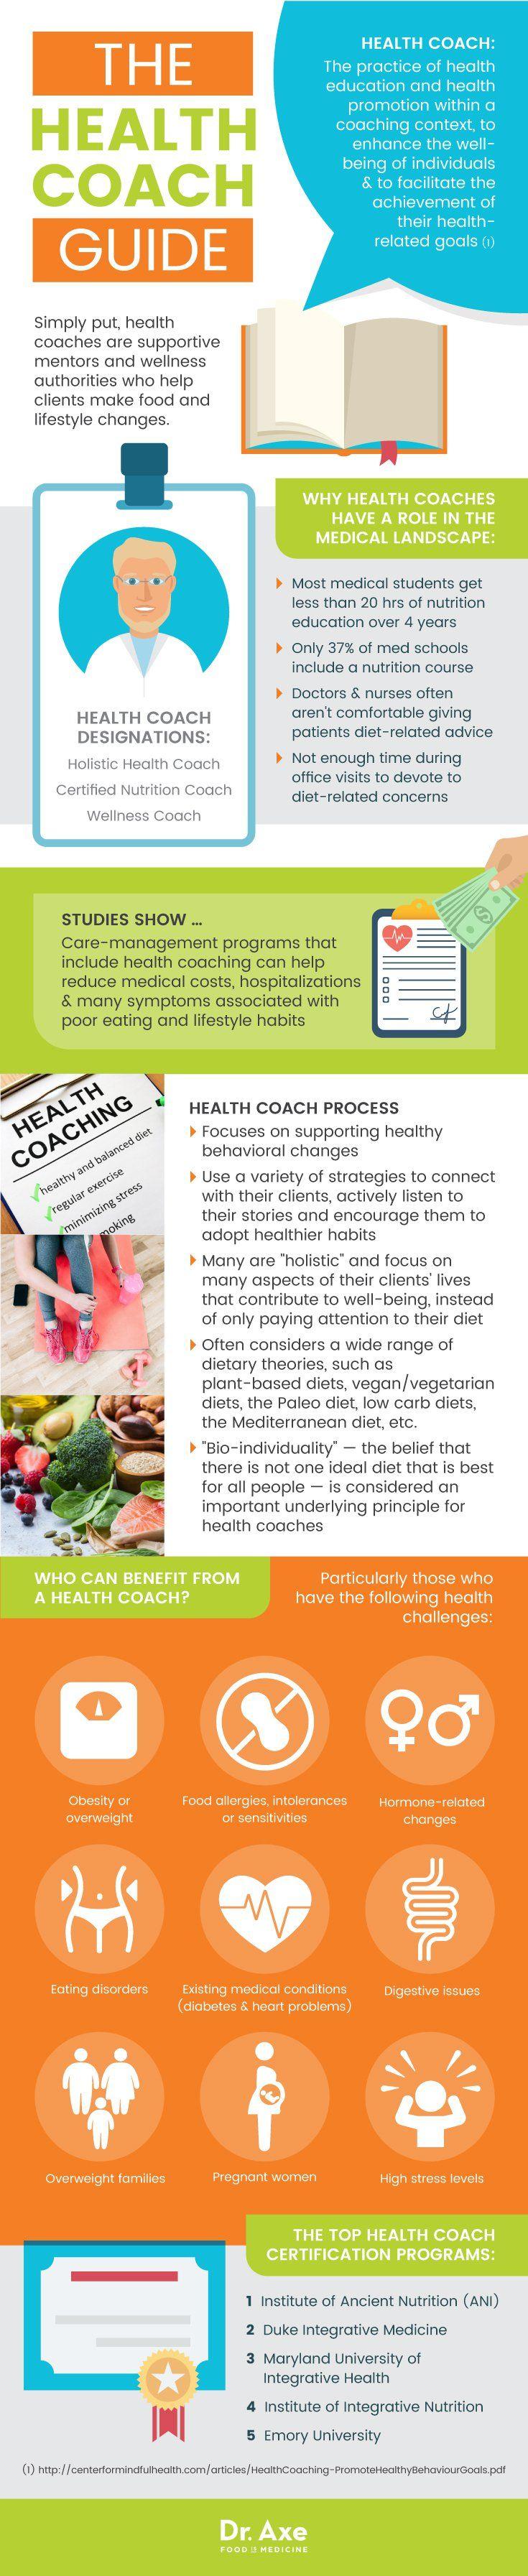 Health coach guide - Dr. Axe http://www.draxe.com #health #holistic #natural